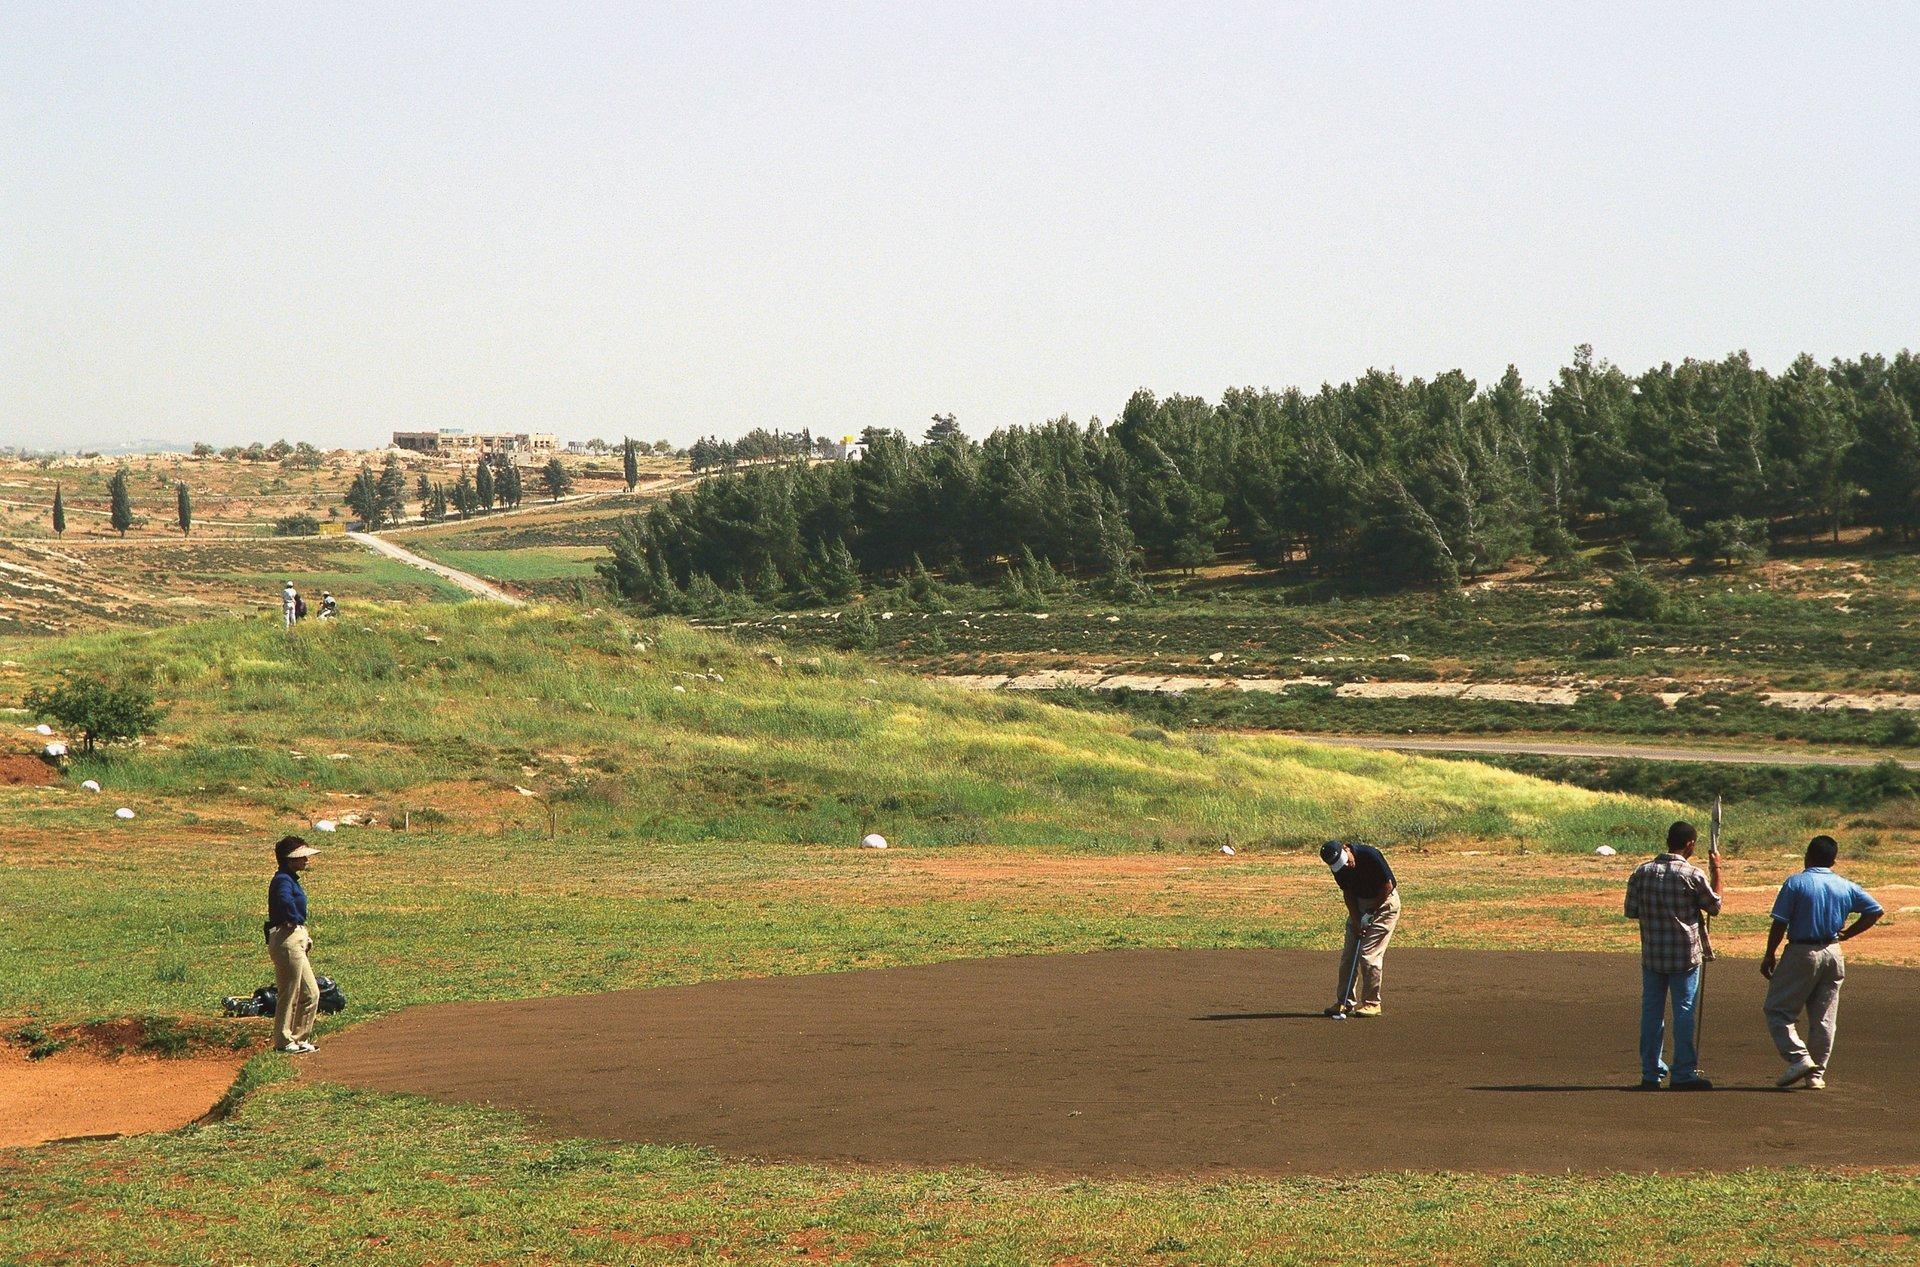 Sand Golf in Jordan 2020 - Best Time